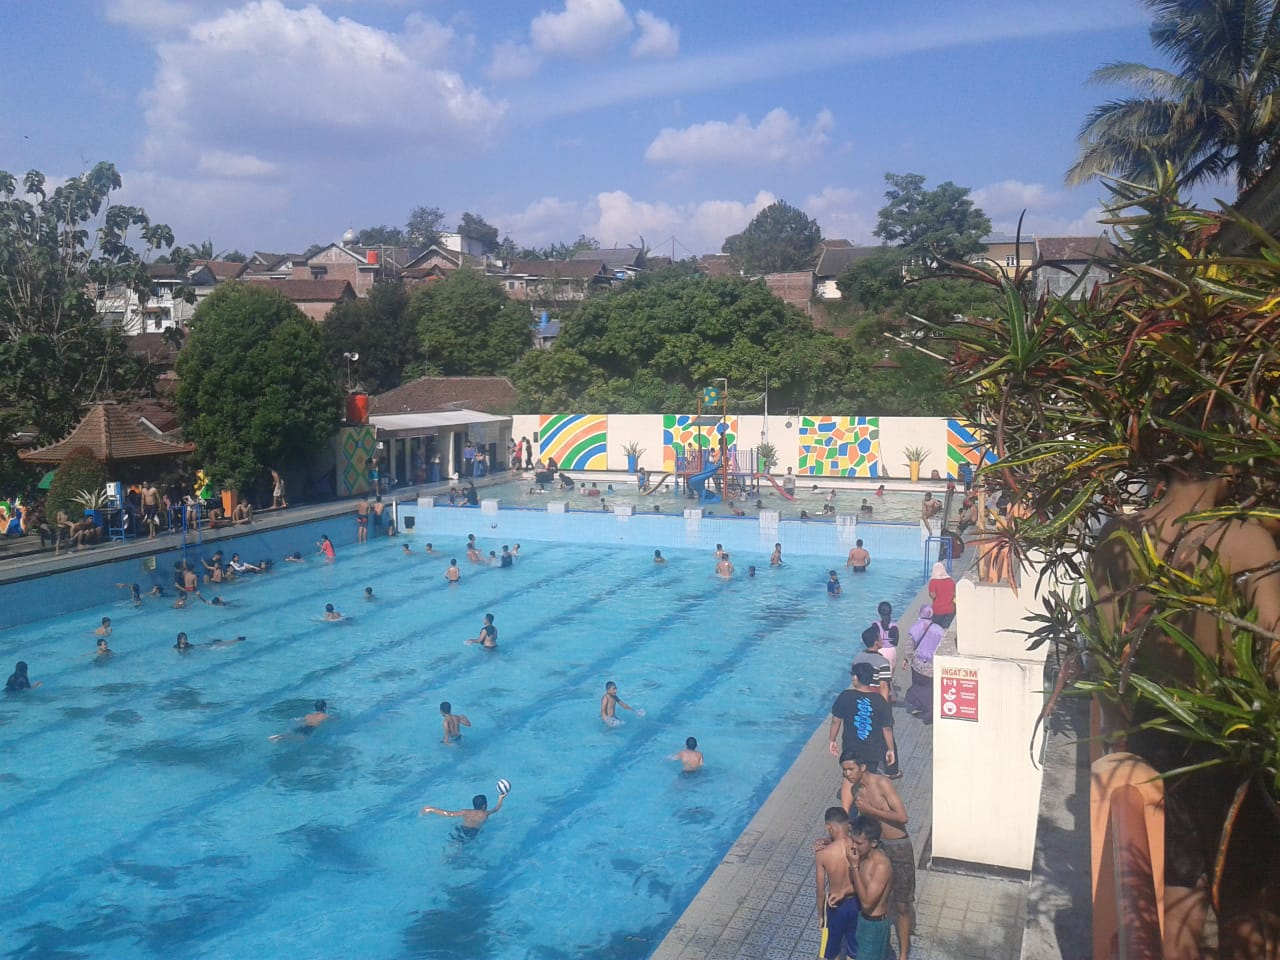 Obyek wisata Kalitaman Salatiga mulai ramai pengunjung